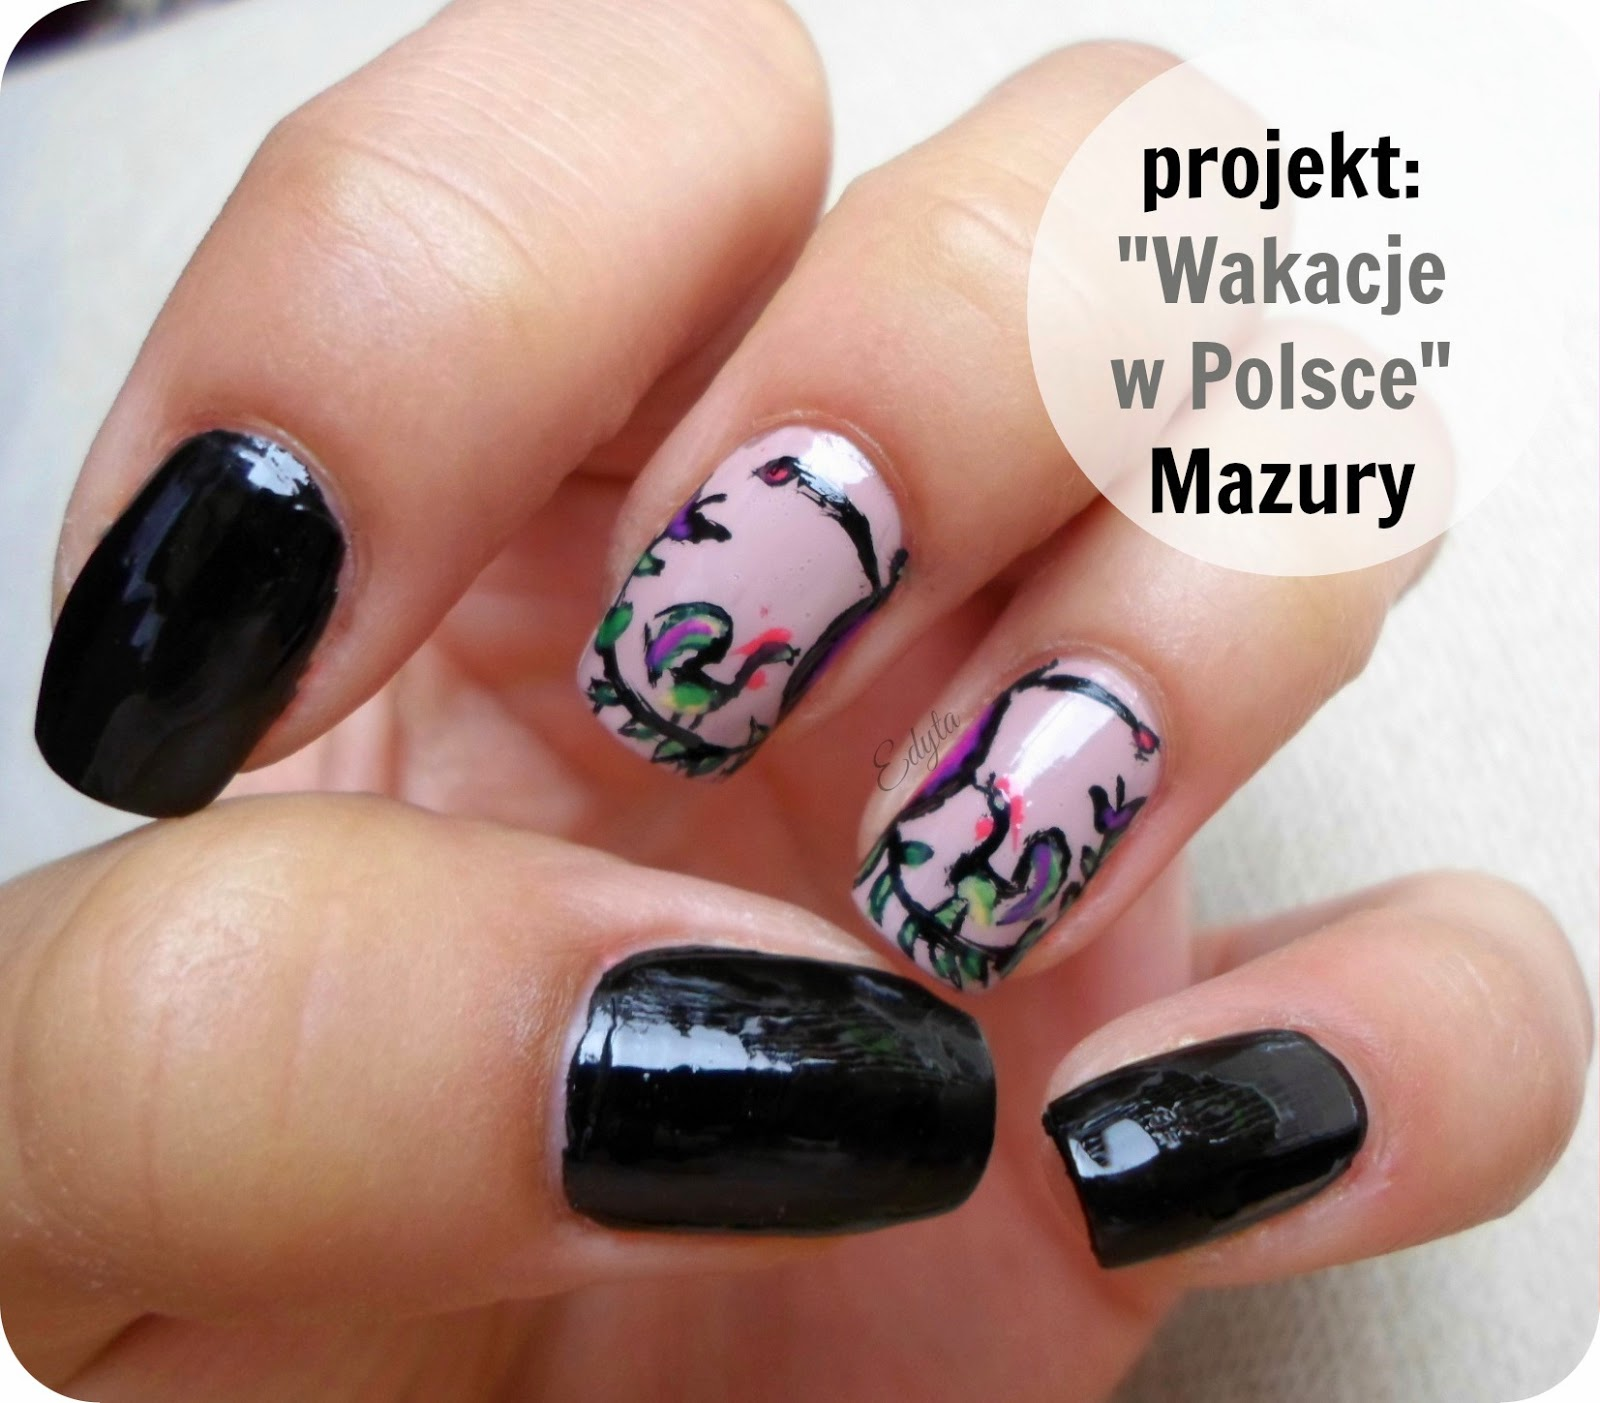 http://nailsandmore2.blogspot.com/2014/07/wakacje-w-polsce-mazury.html